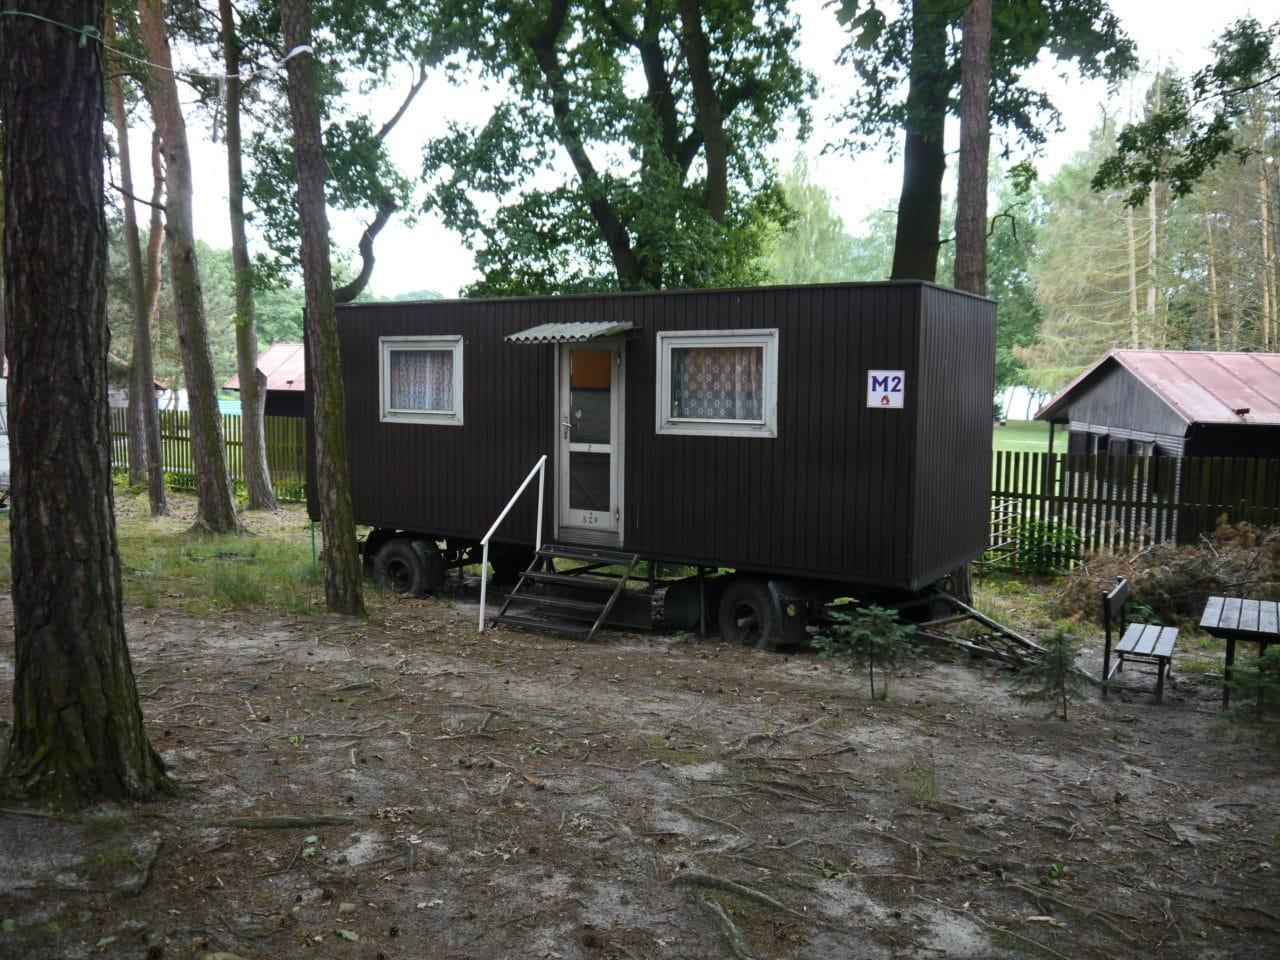 Maringotky a karavany